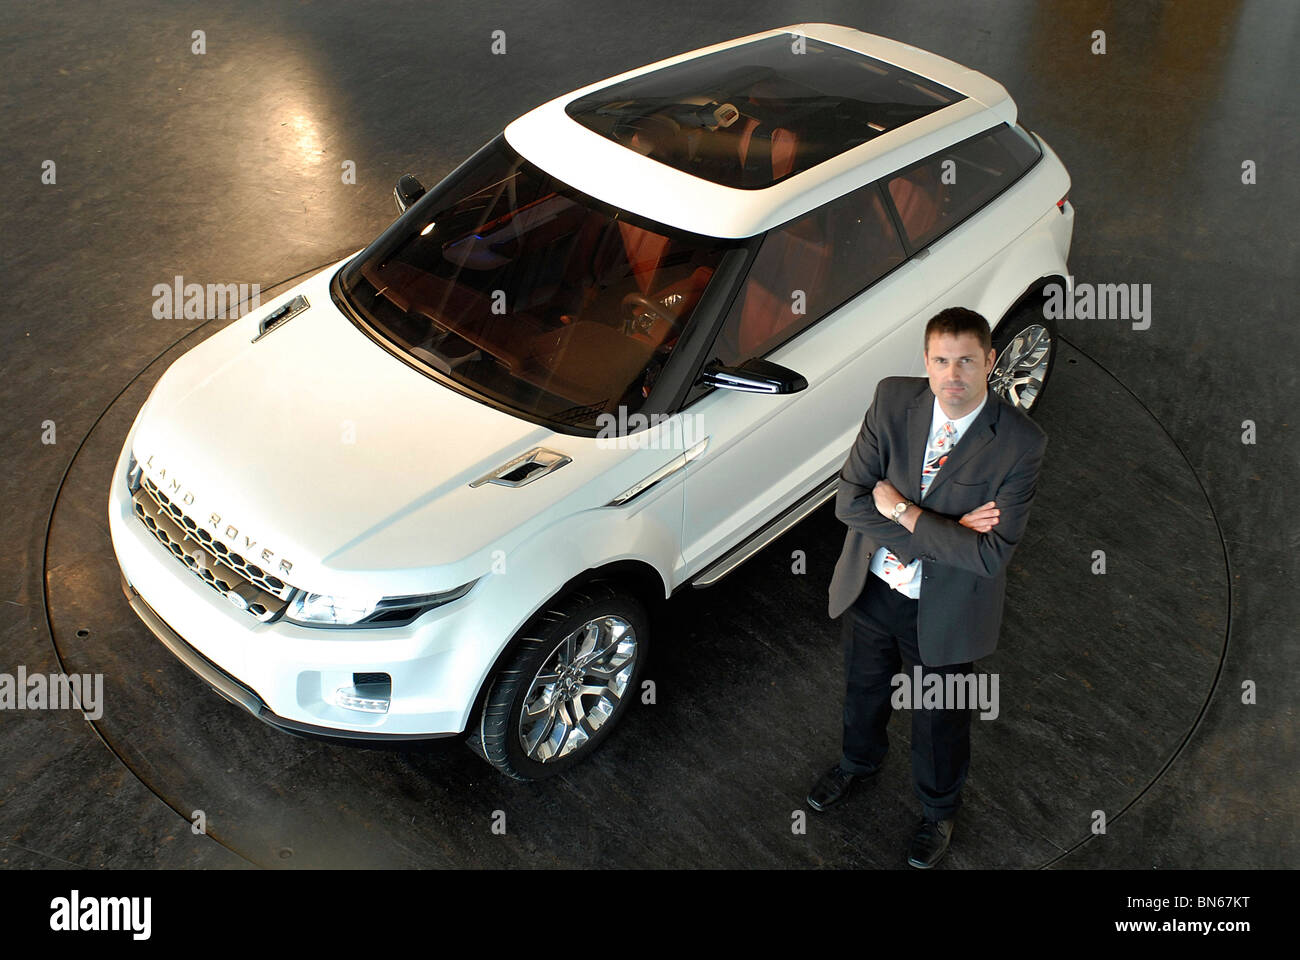 https://c8.alamy.com/comp/BN67KT/managing-director-phil-popham-with-the-land-rover-lrx-concept-car-BN67KT.jpg